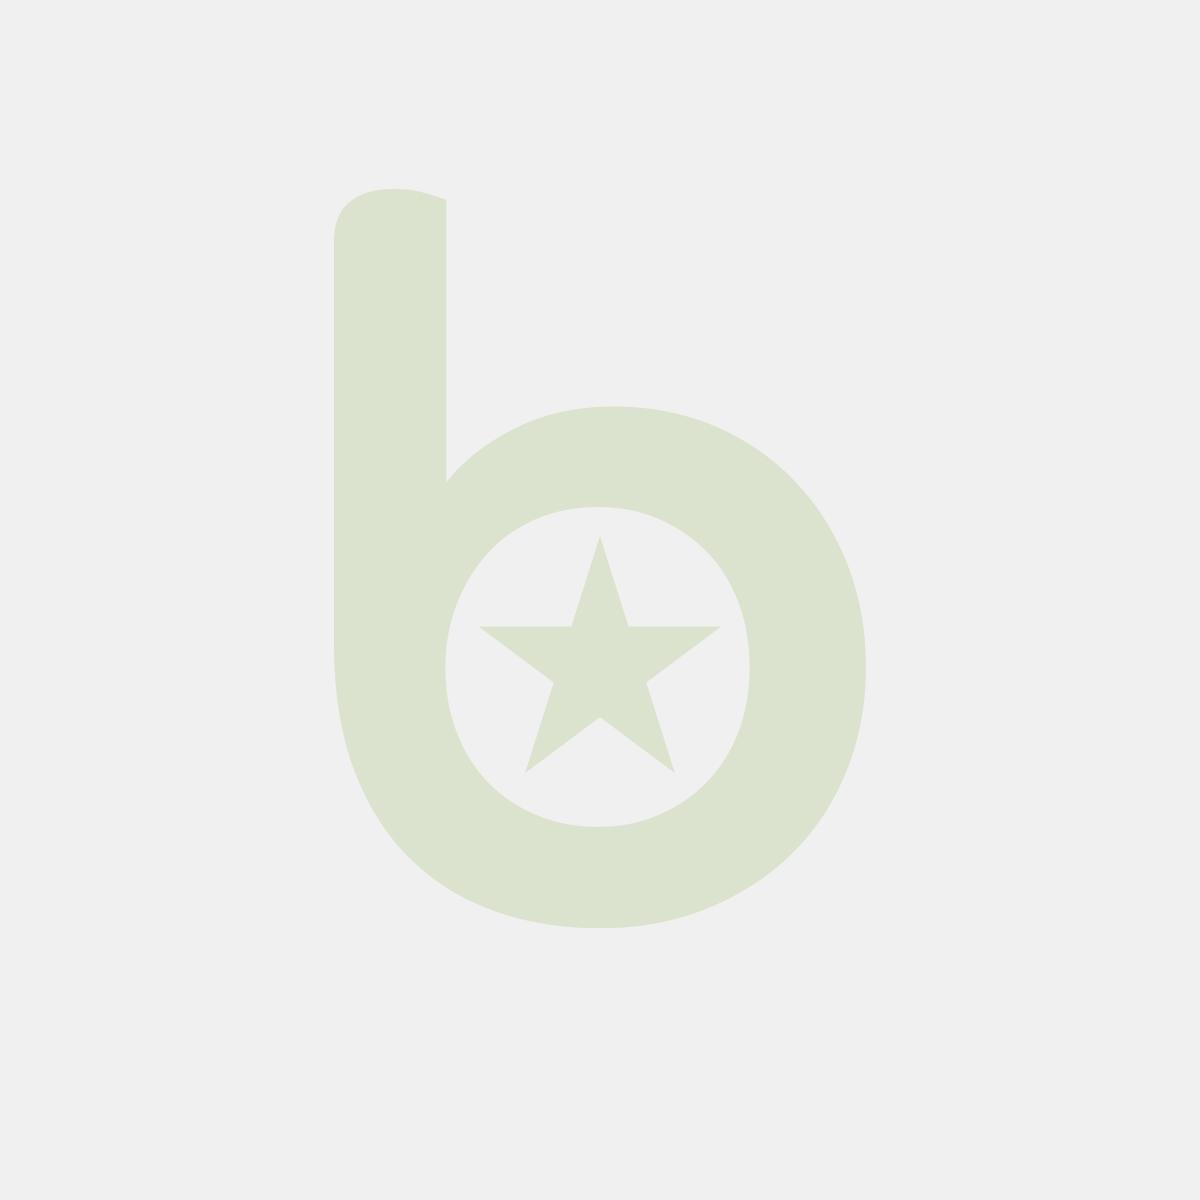 FINGERFOOD - pucharek 60ml DOMINO SCIVOLO PS transparentny op. 50 sztuk